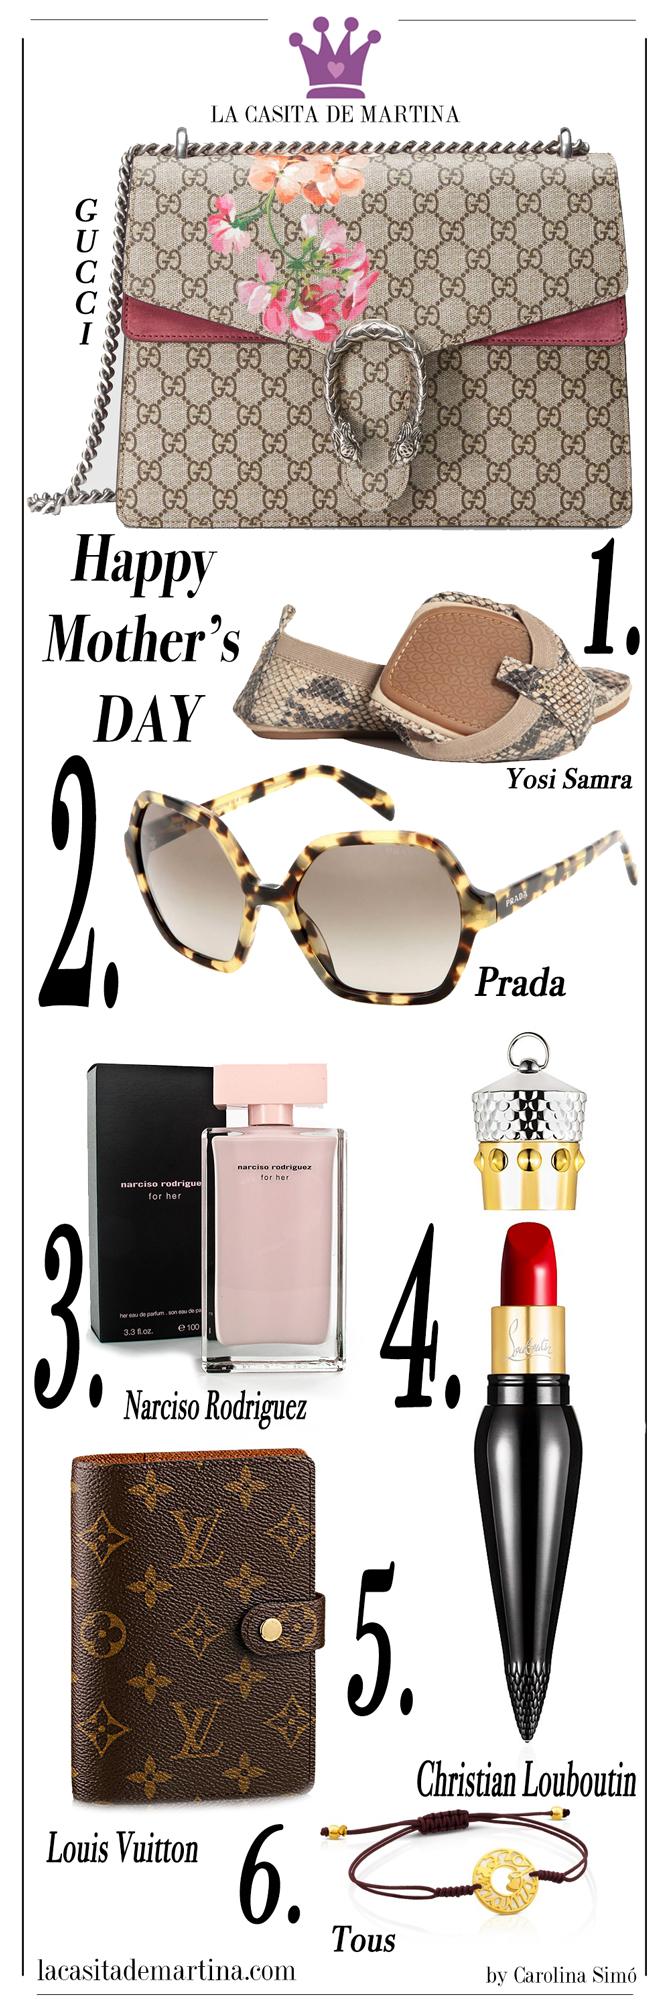 Día de la Madre, Blog de Moda Infantil, La casita de Martina, kids fashion blog